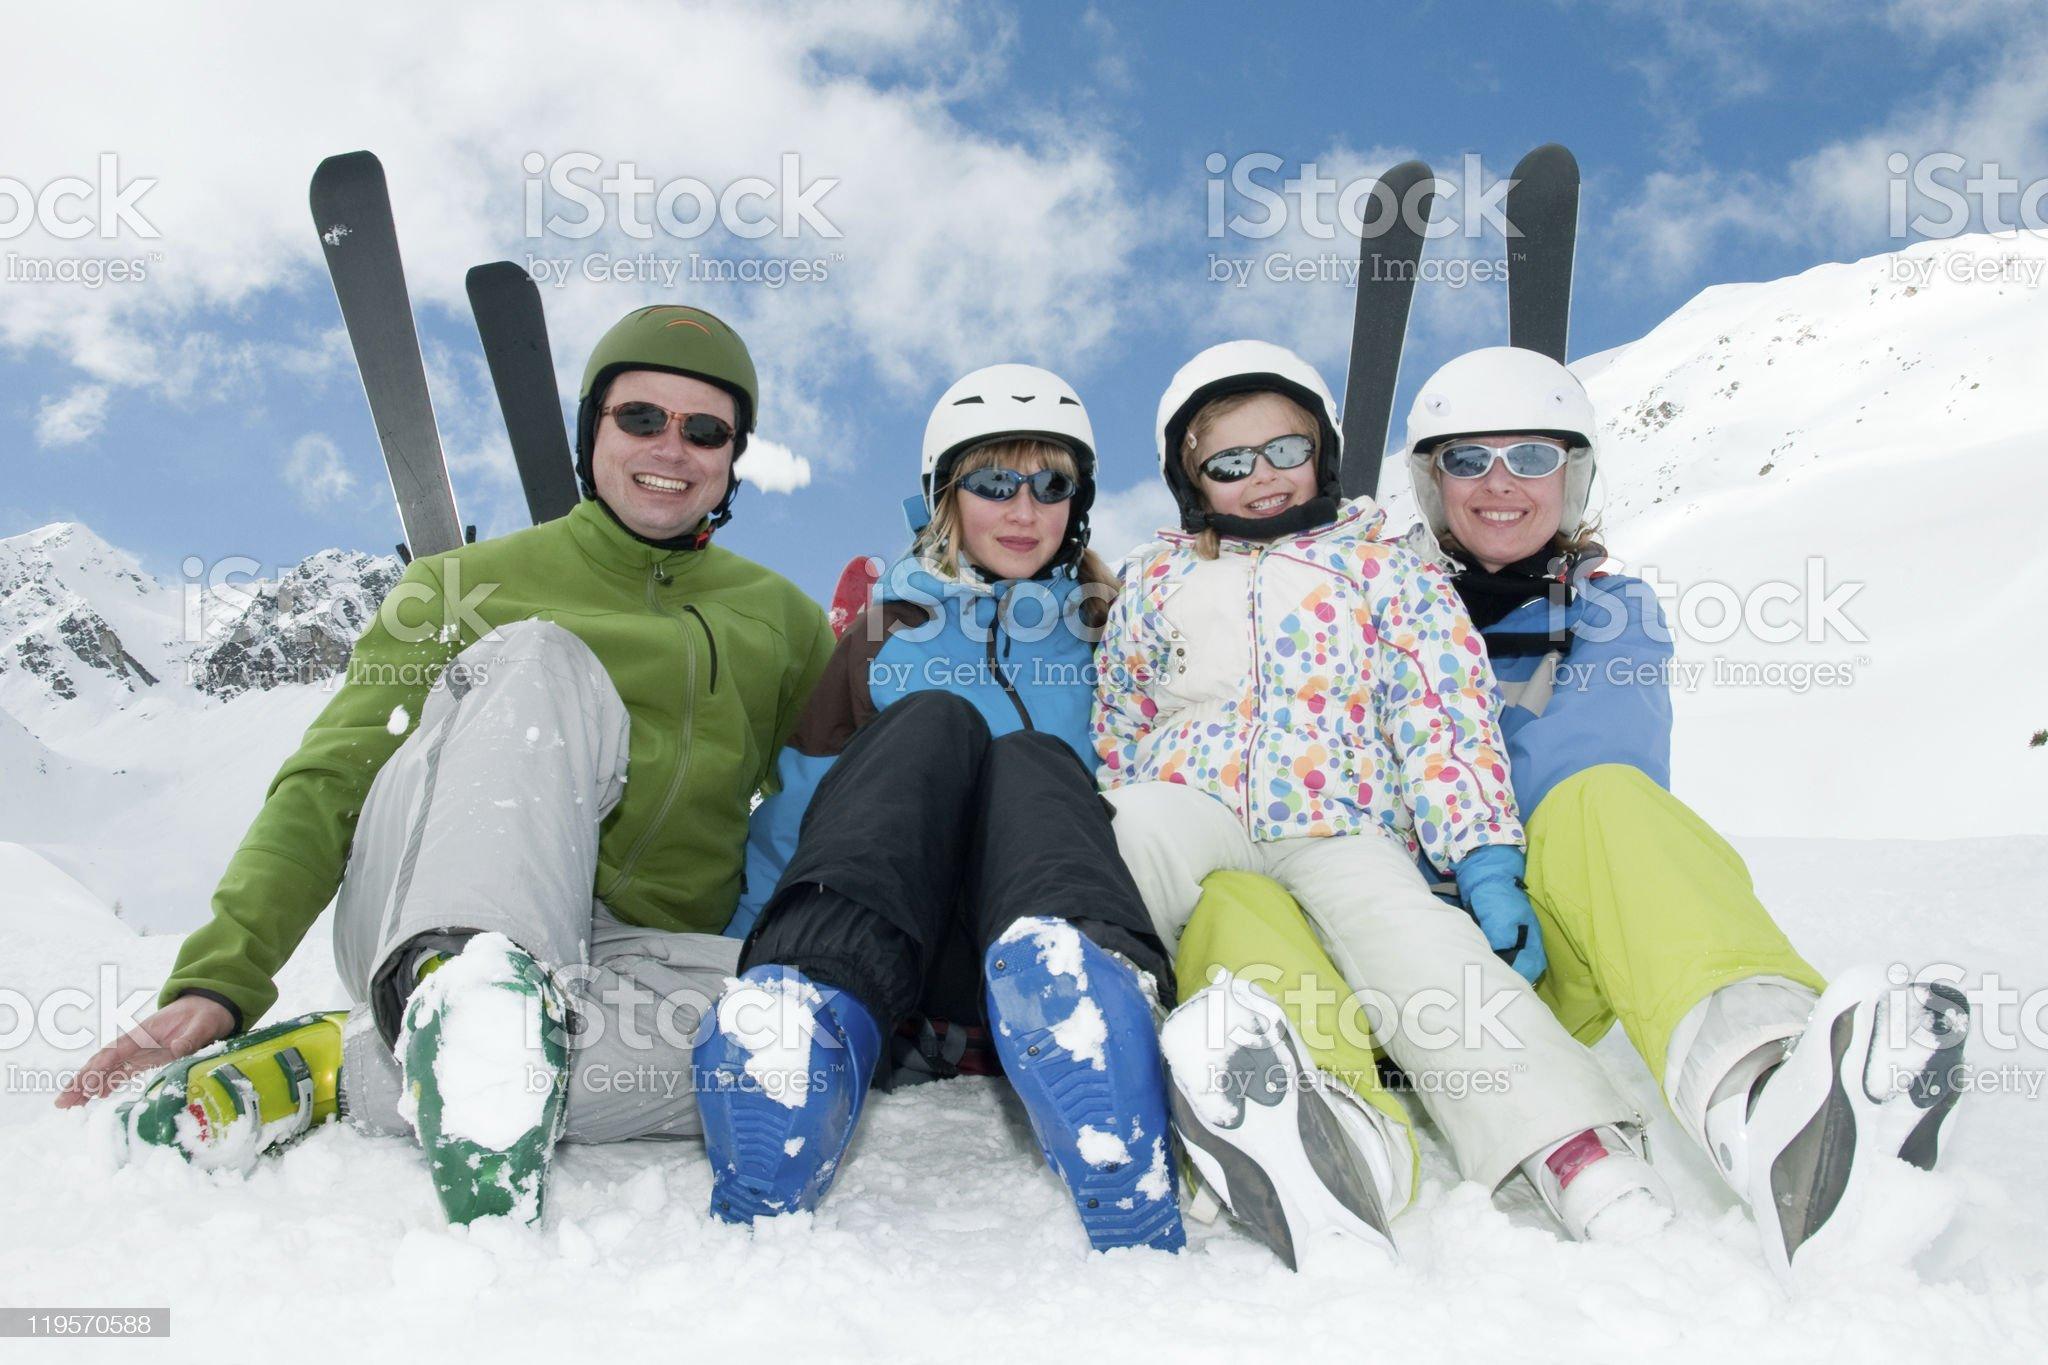 Happy family ski team royalty-free stock photo